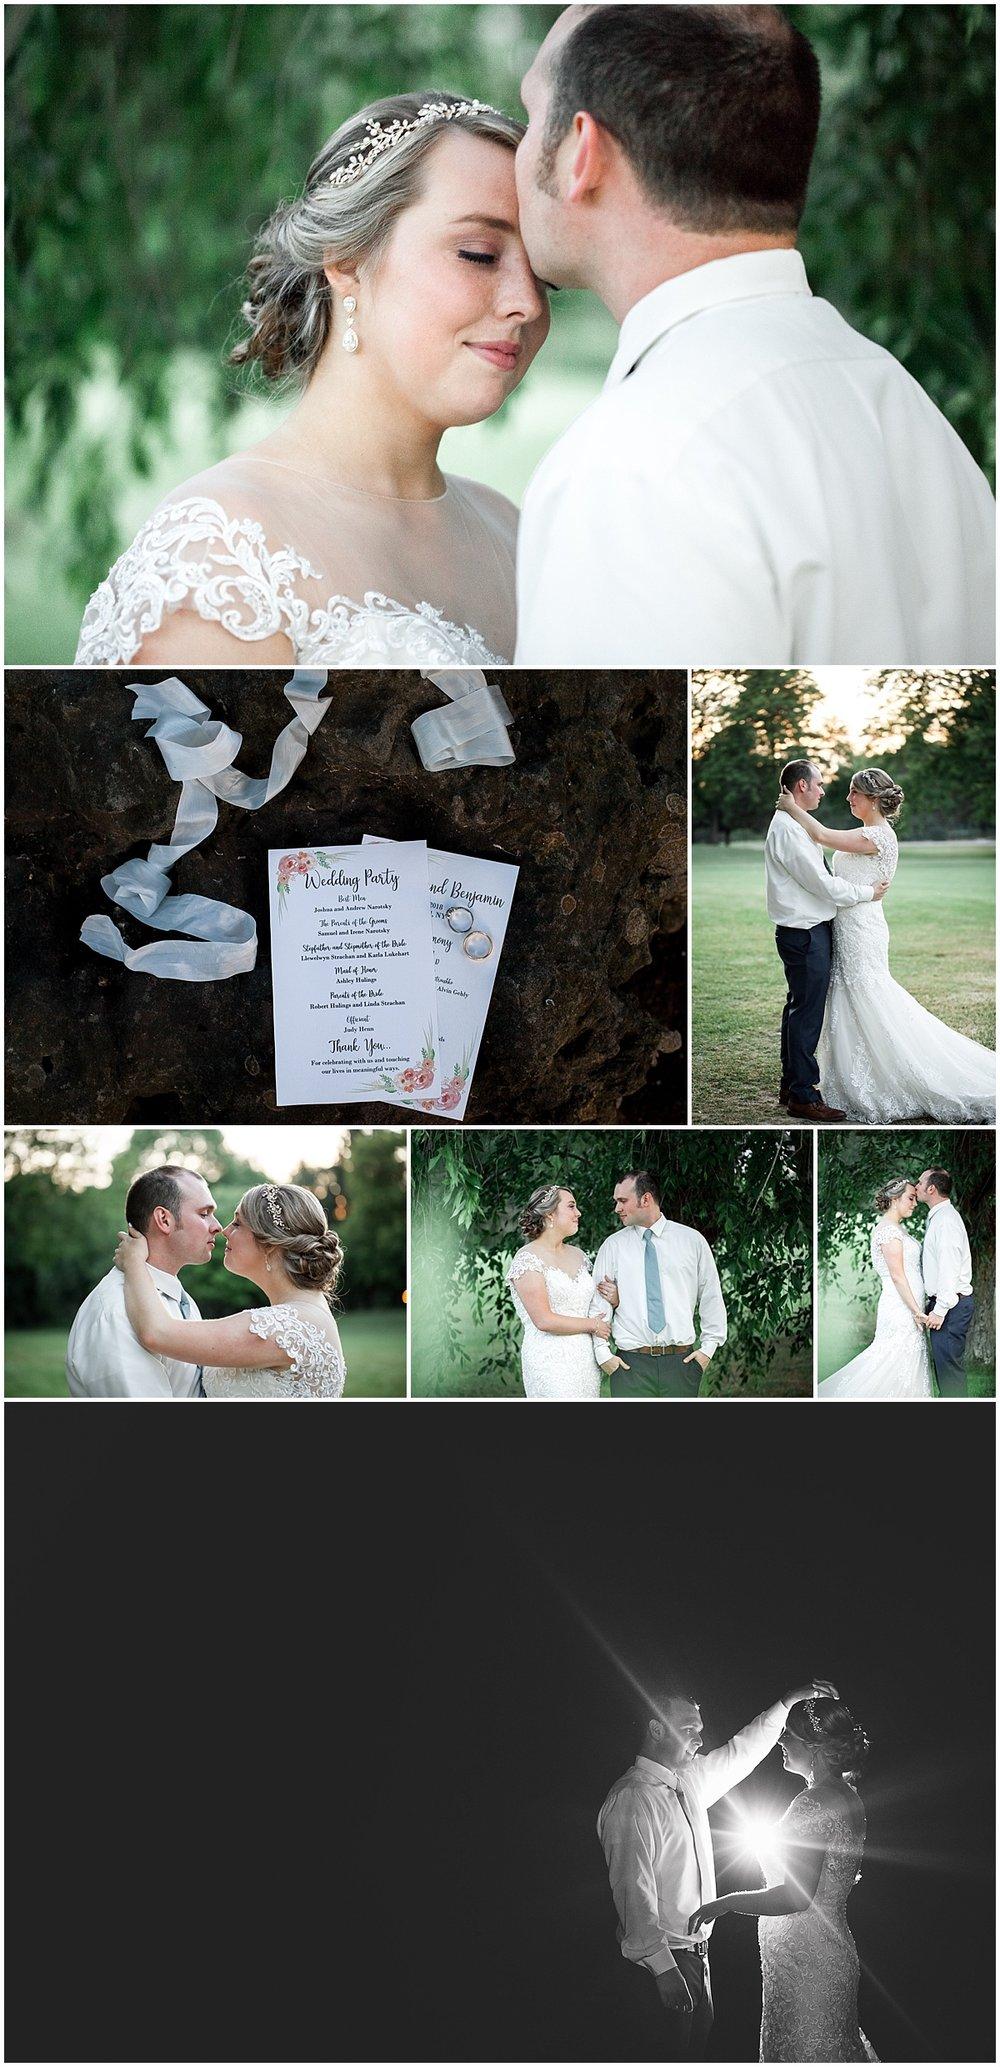 congratstothemarriednycouple